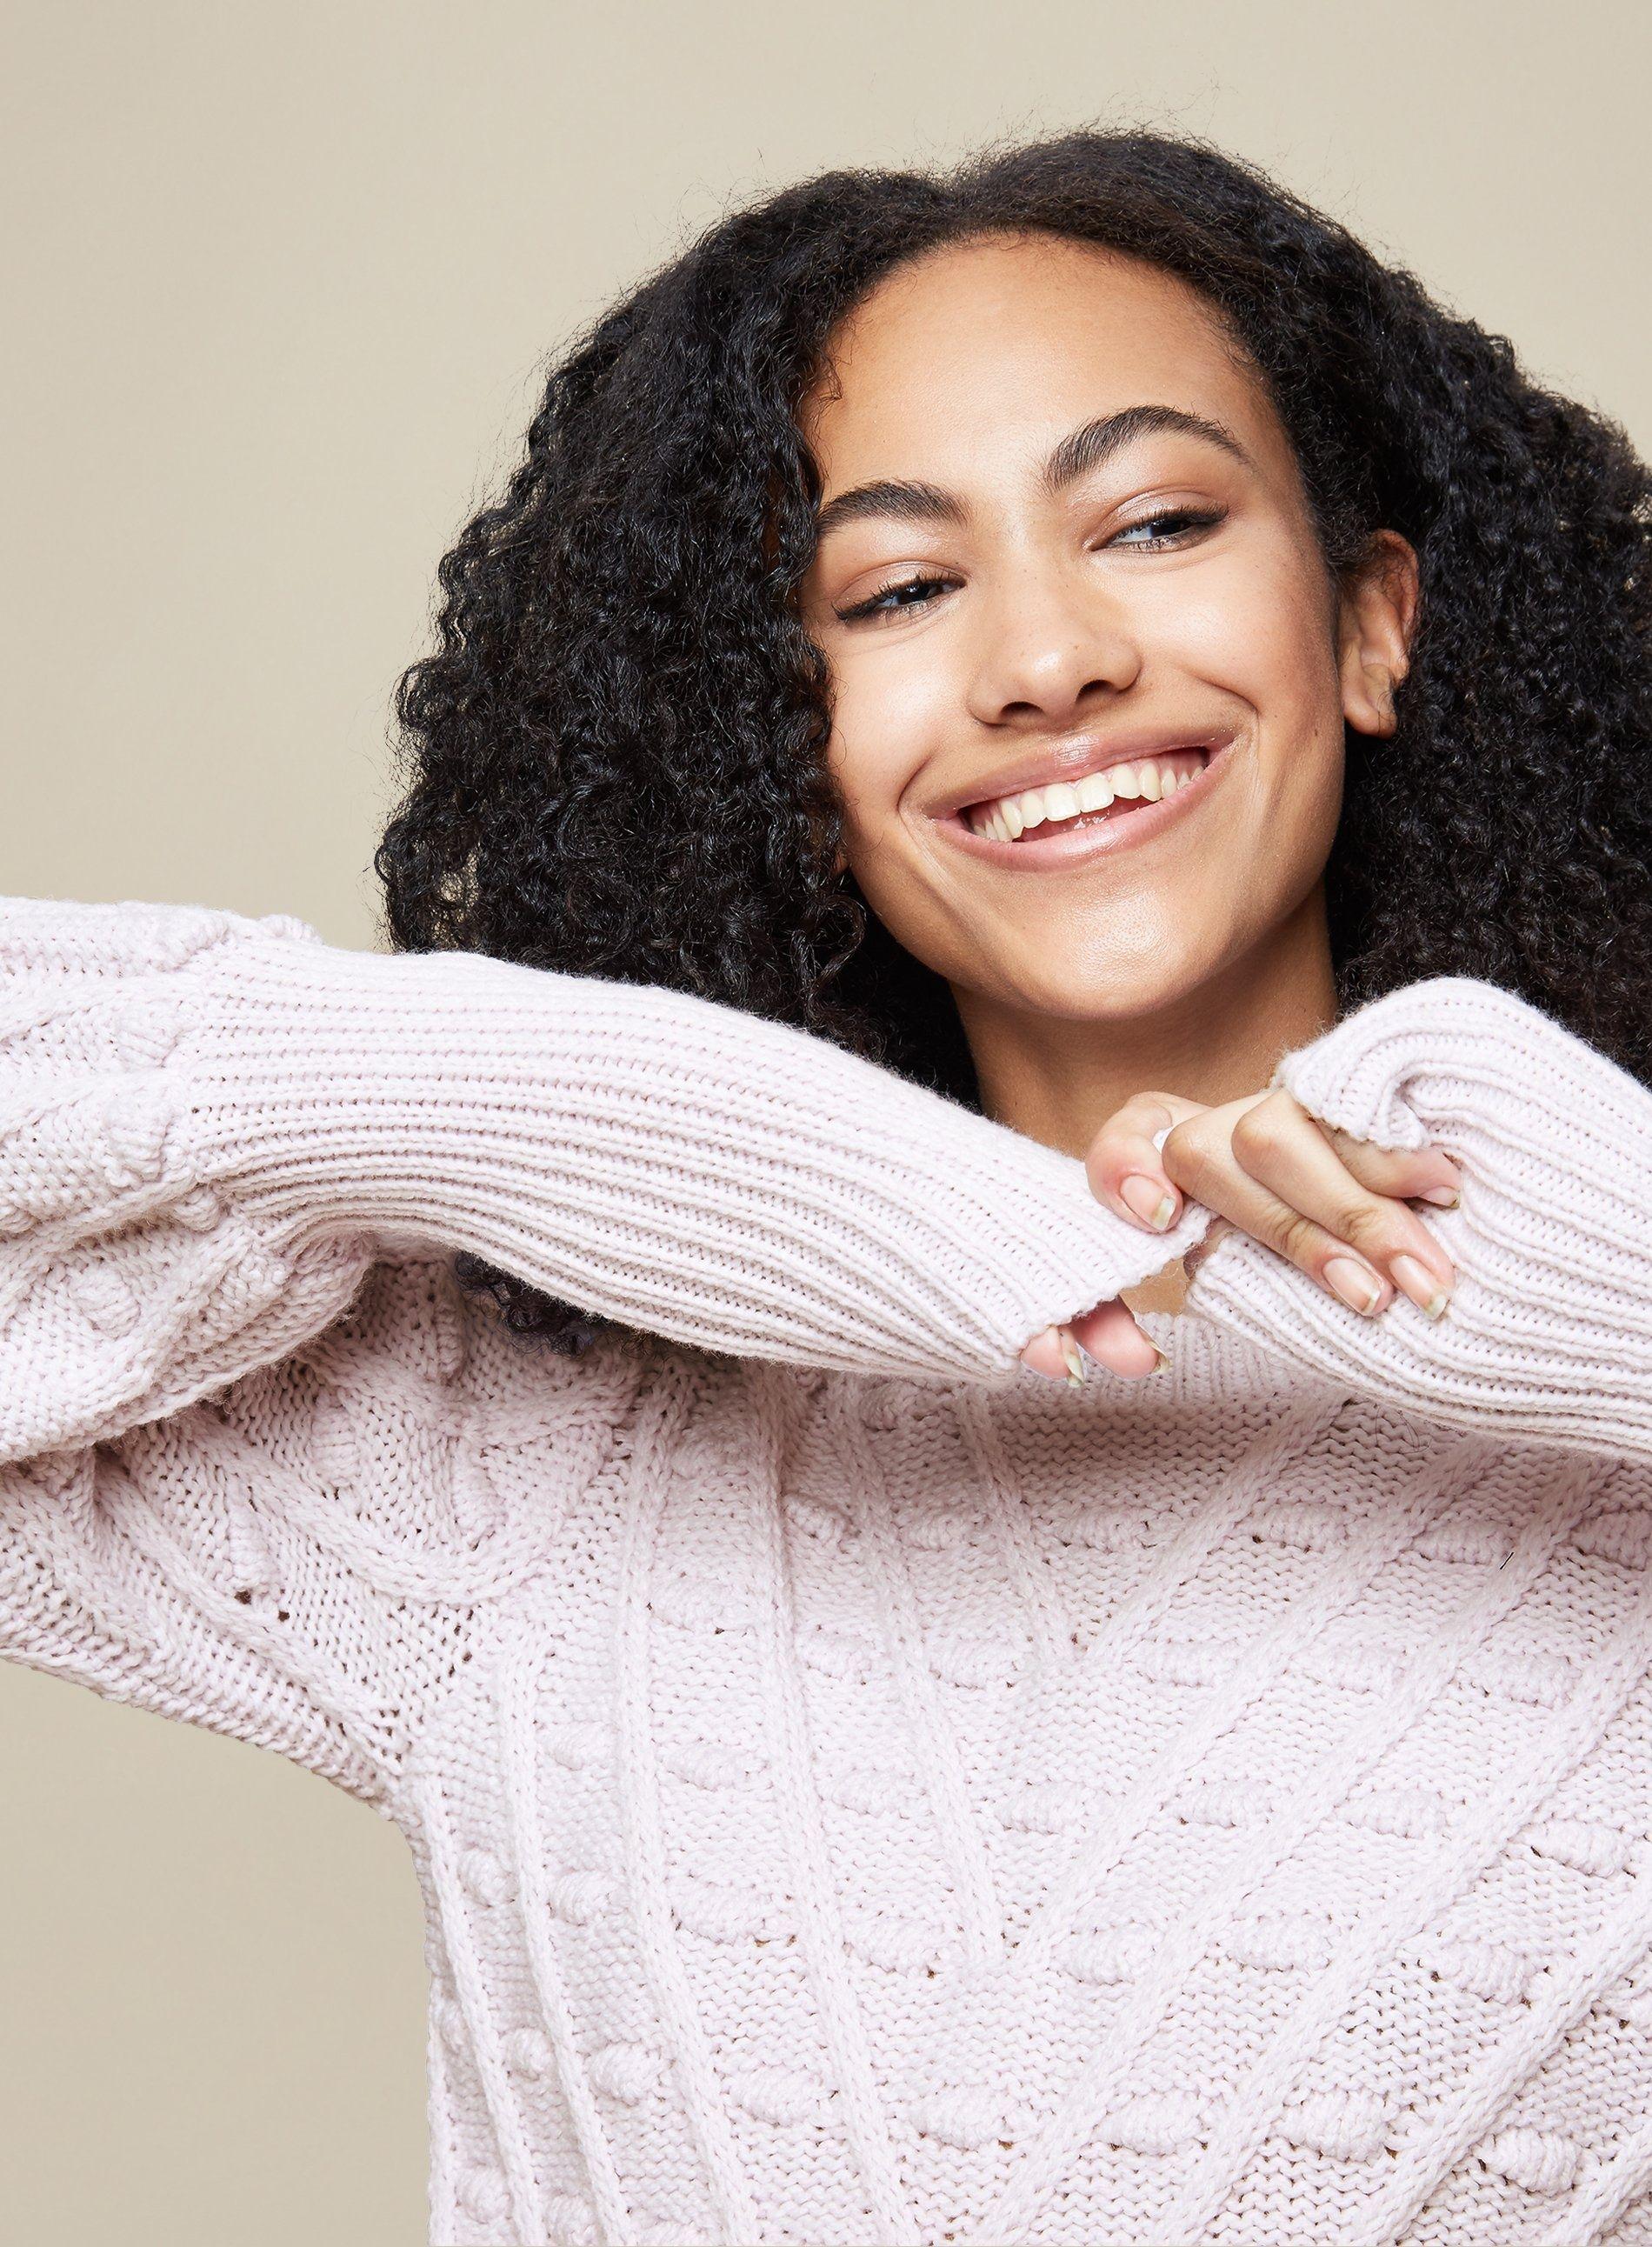 Dorothy Perkins Womens Tall Purple Bobble Jumper Sweater Pullover Knitwear Top